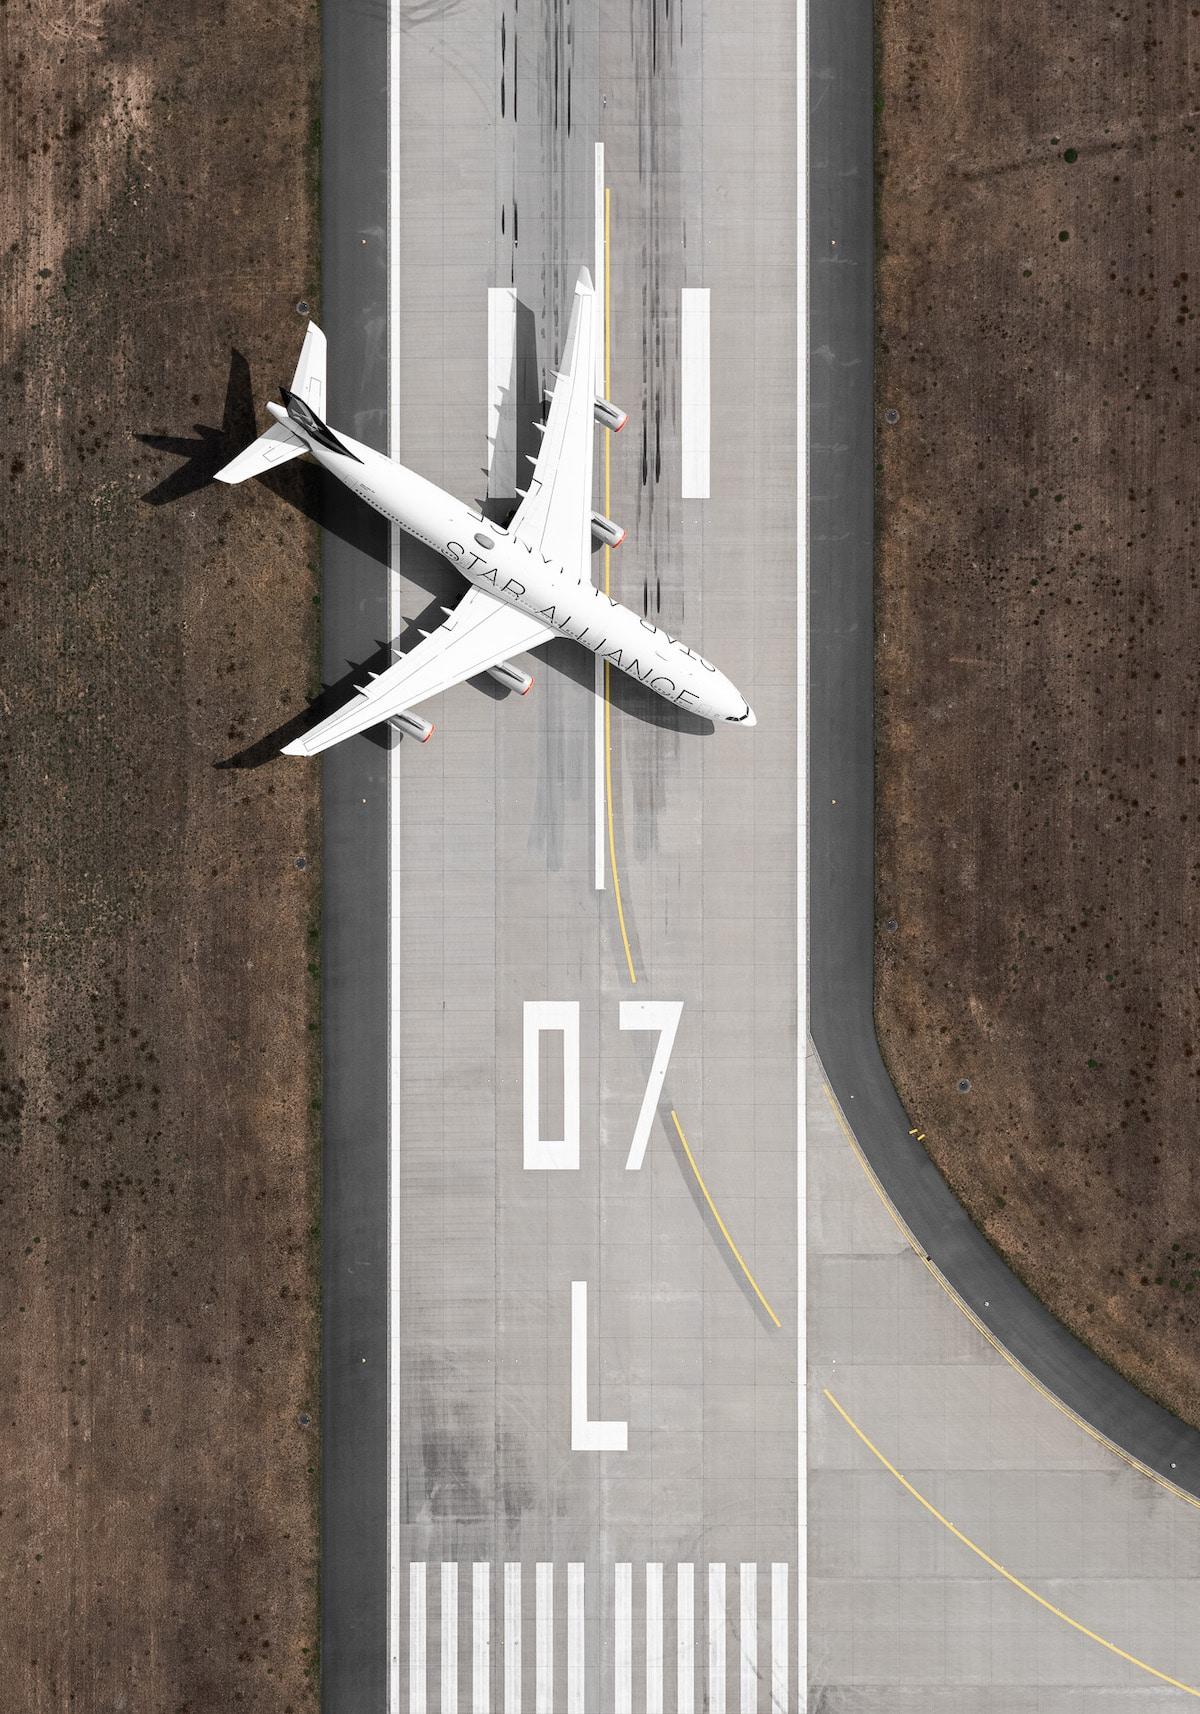 Airplane on a Landing Strip